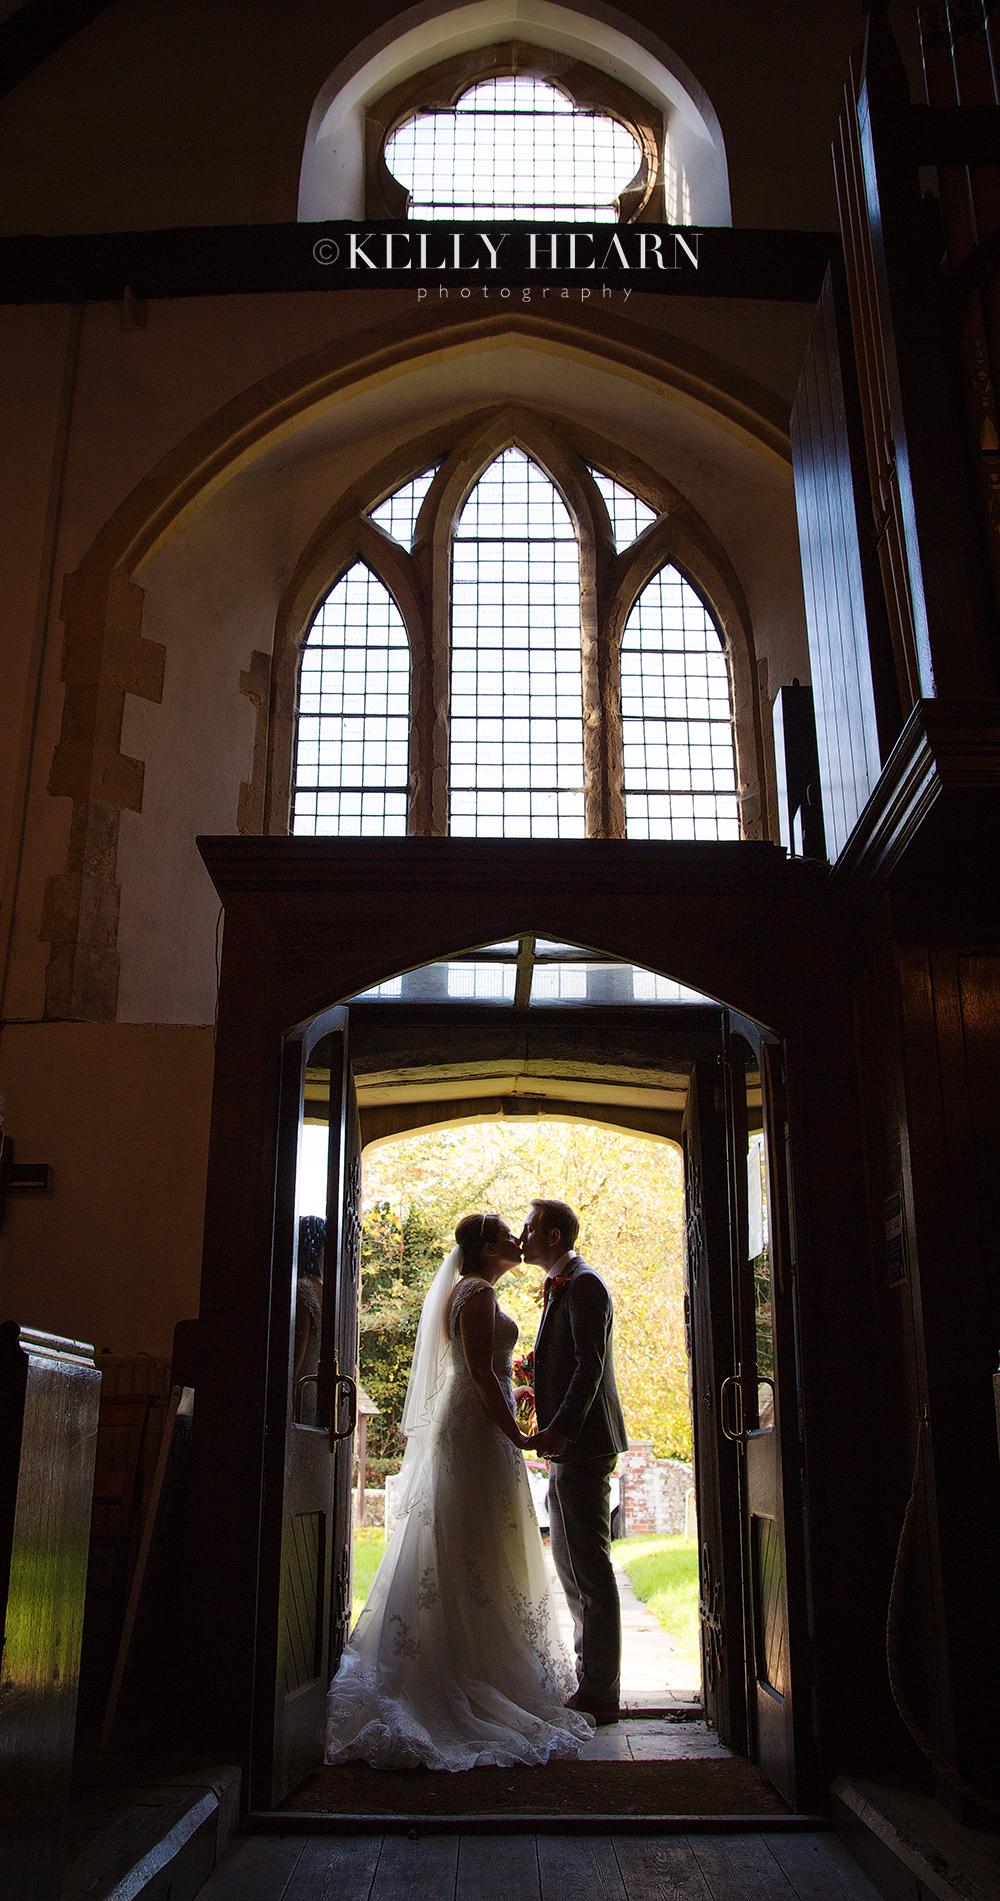 FAG_-Bride-and-groom-church-arch.jpg#asset:1842